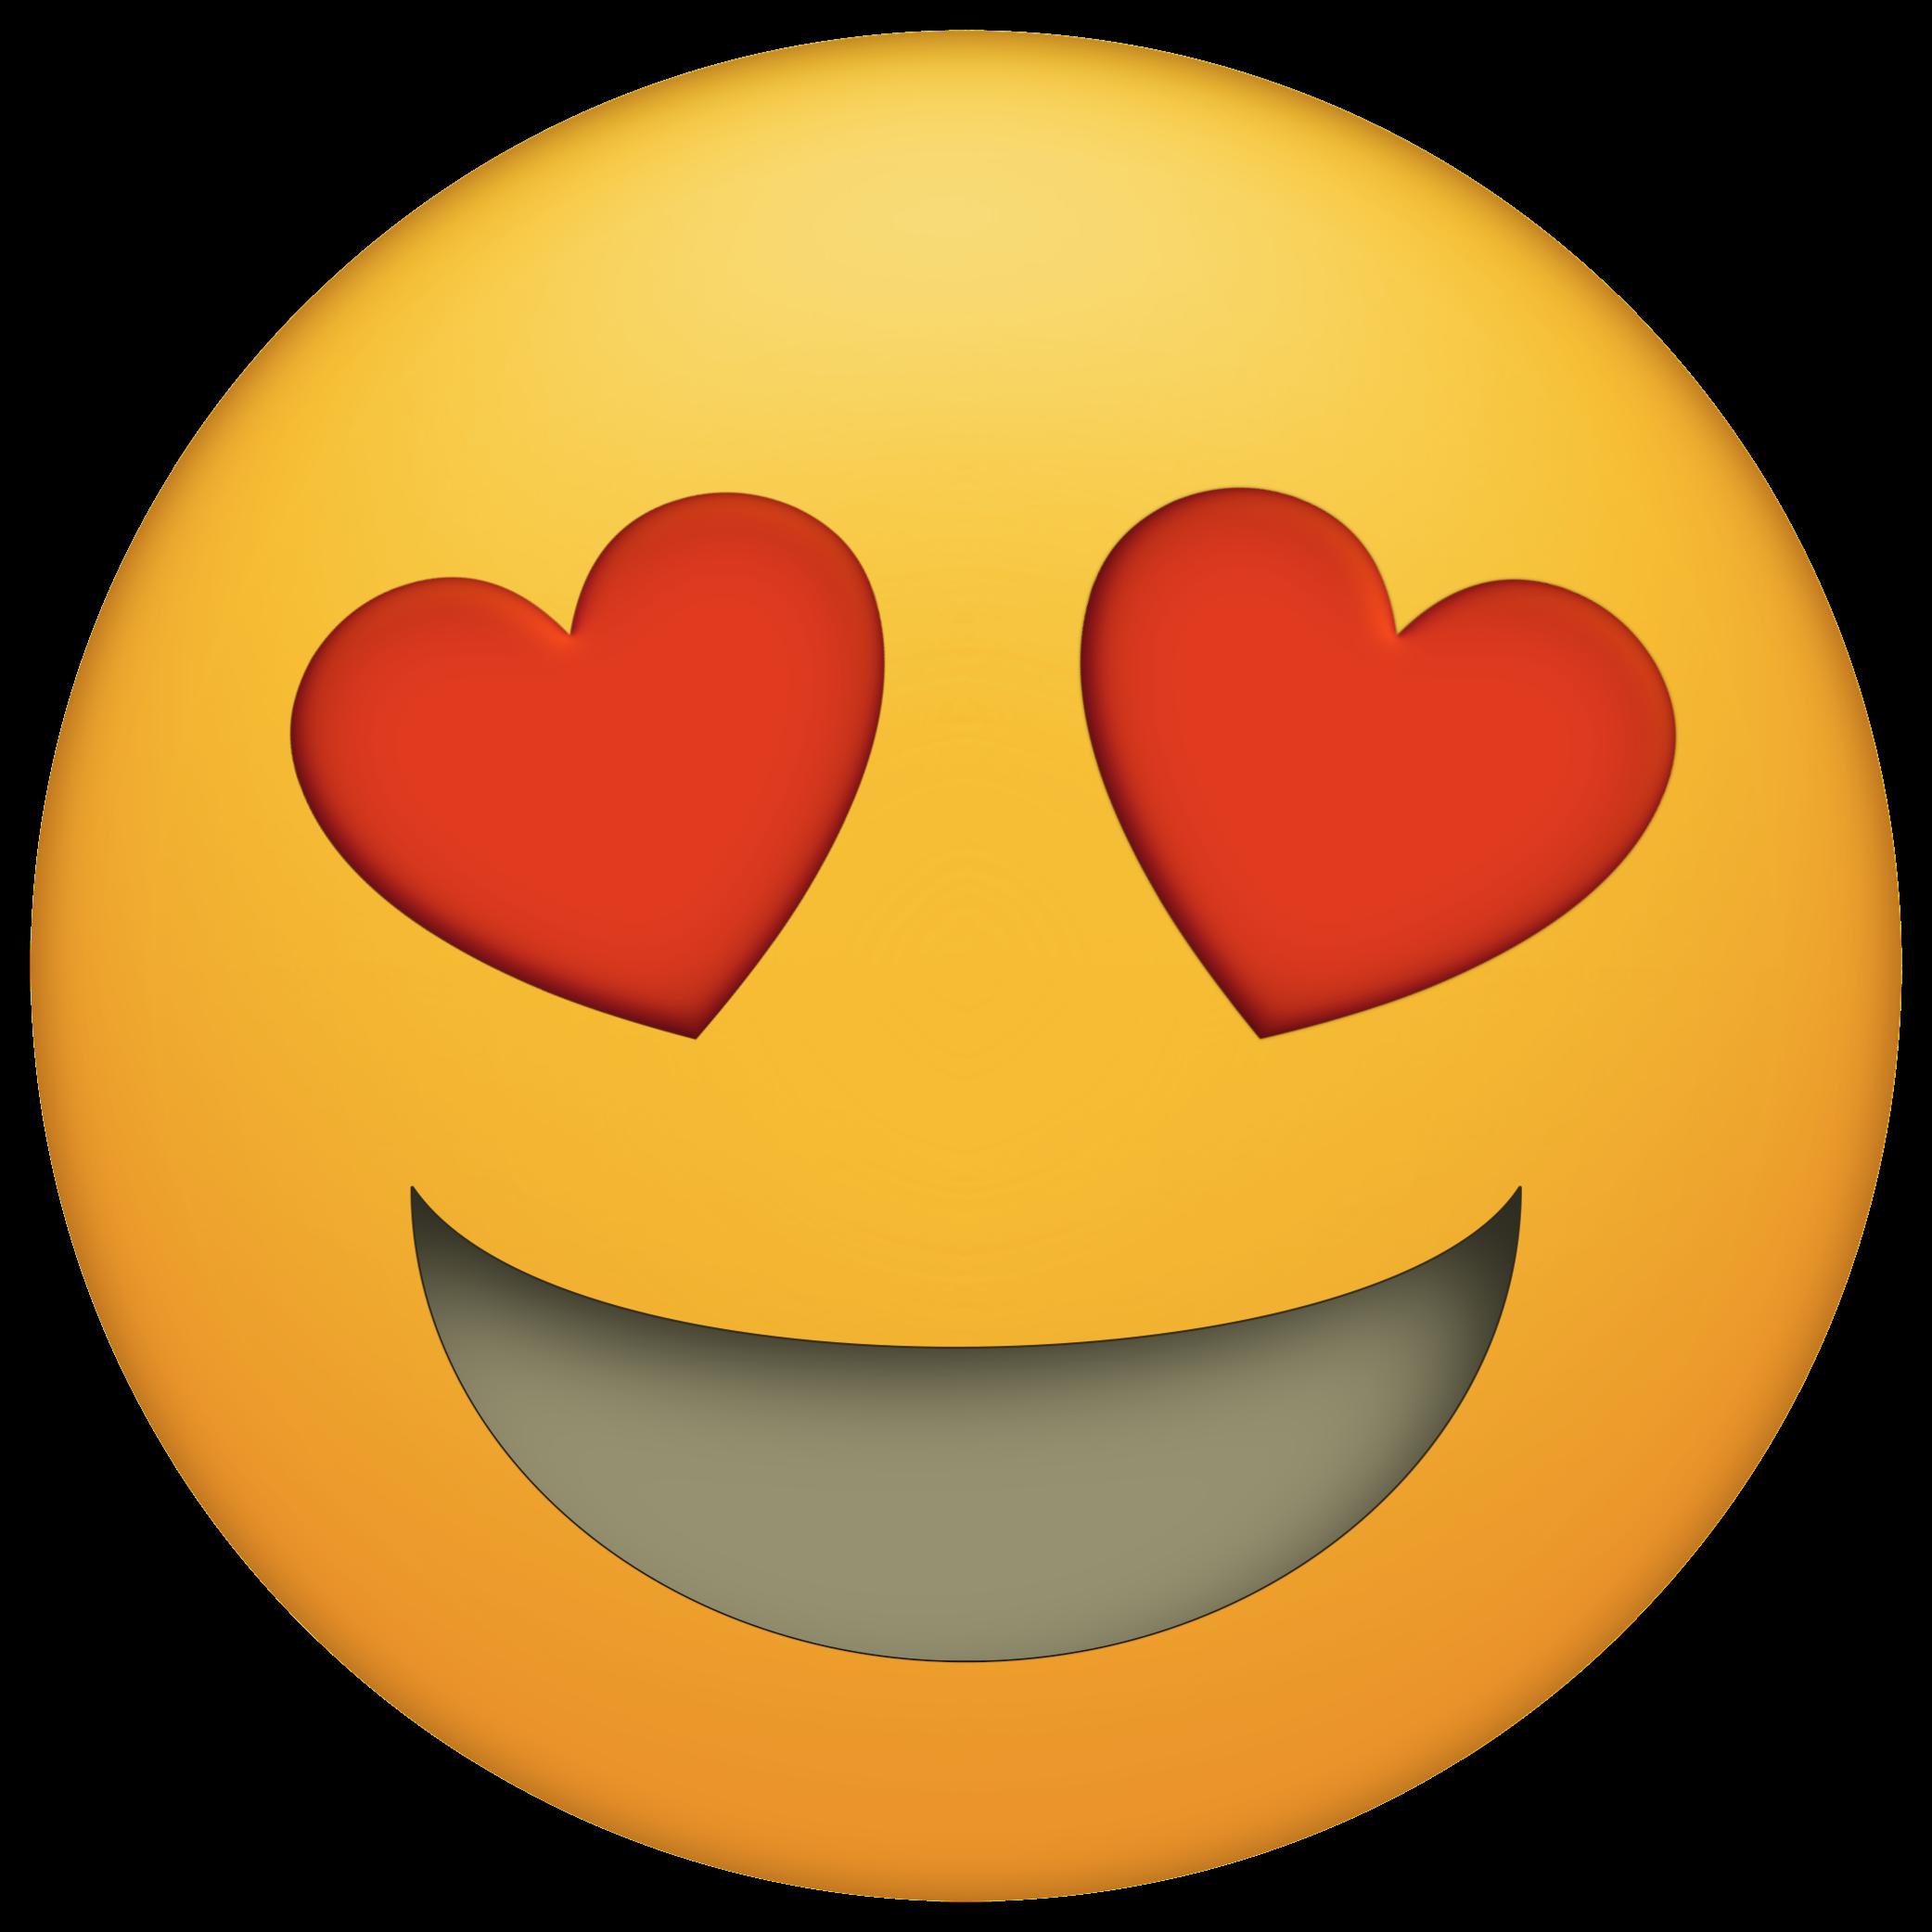 Emoji faces printable free. Eyes clipart emotion